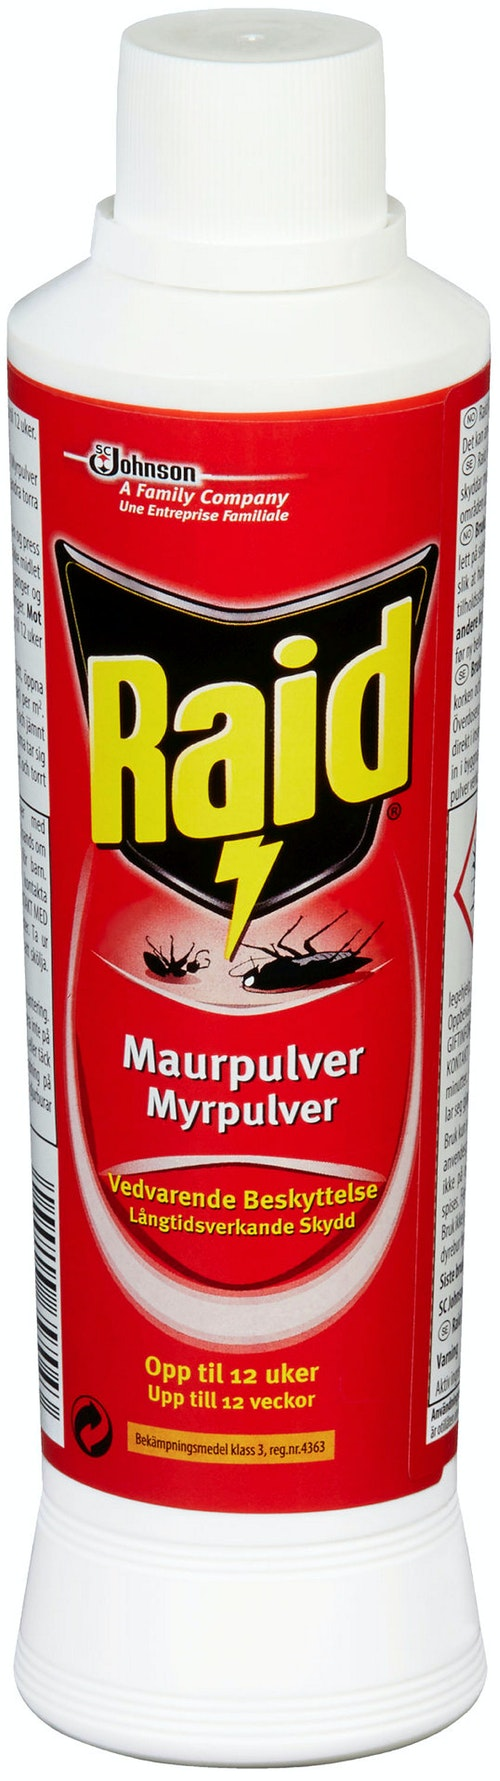 Raid Maurpulver 250 g